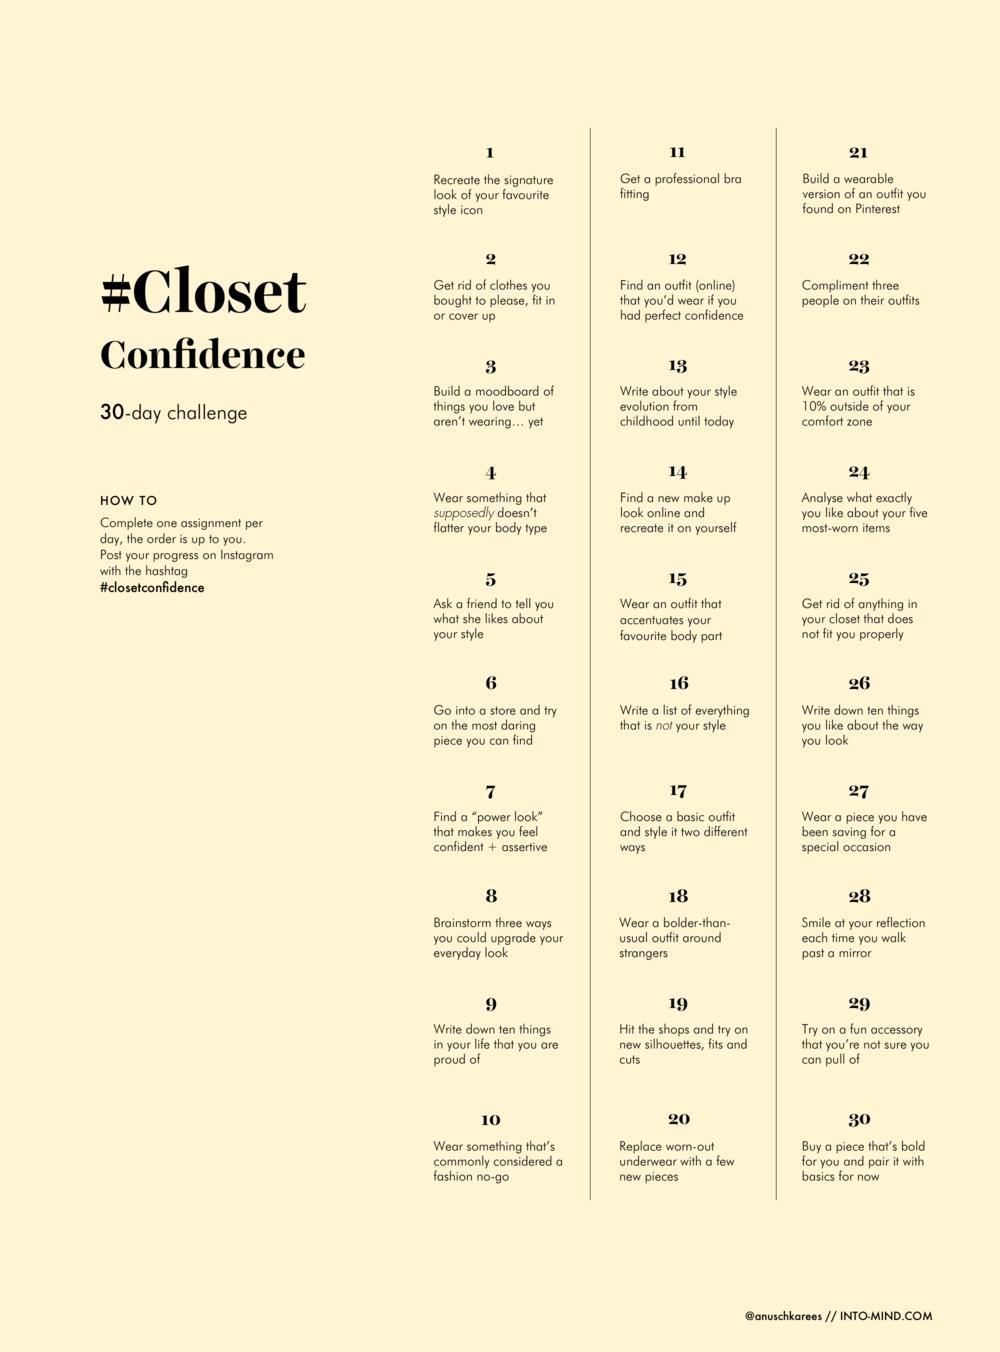 30-Day Closet Confidence Challenge